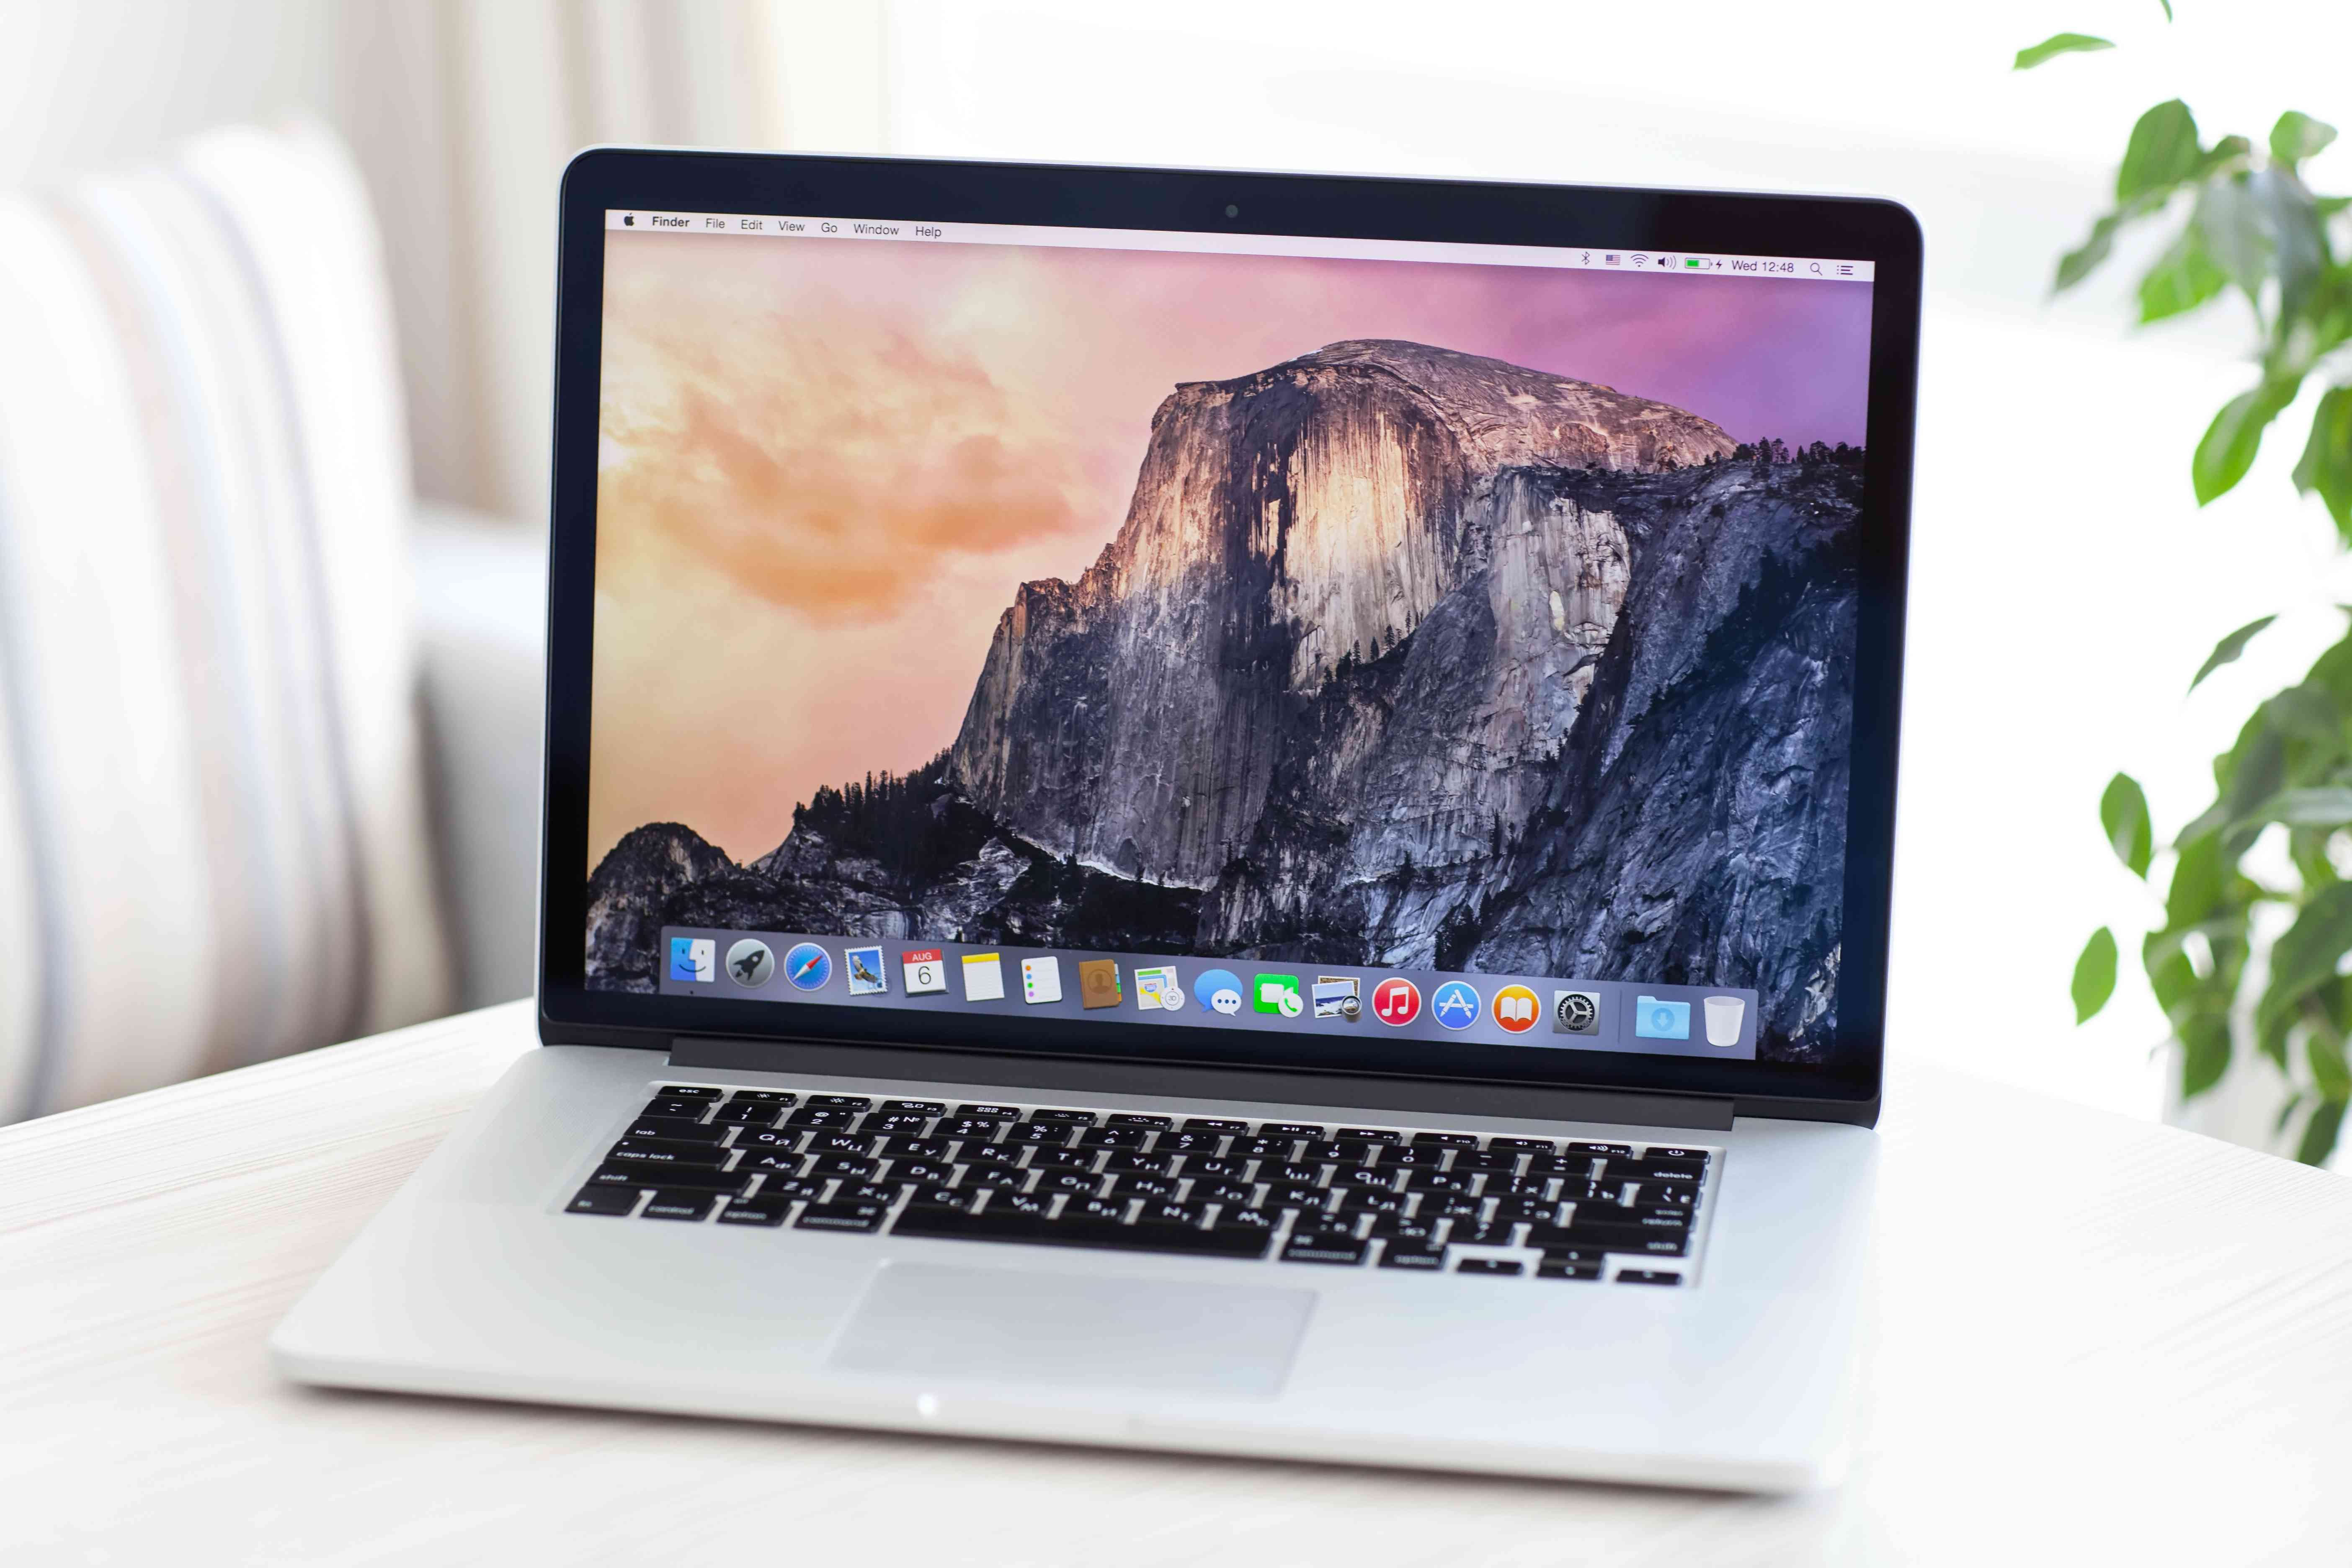 Apple laptop on white table